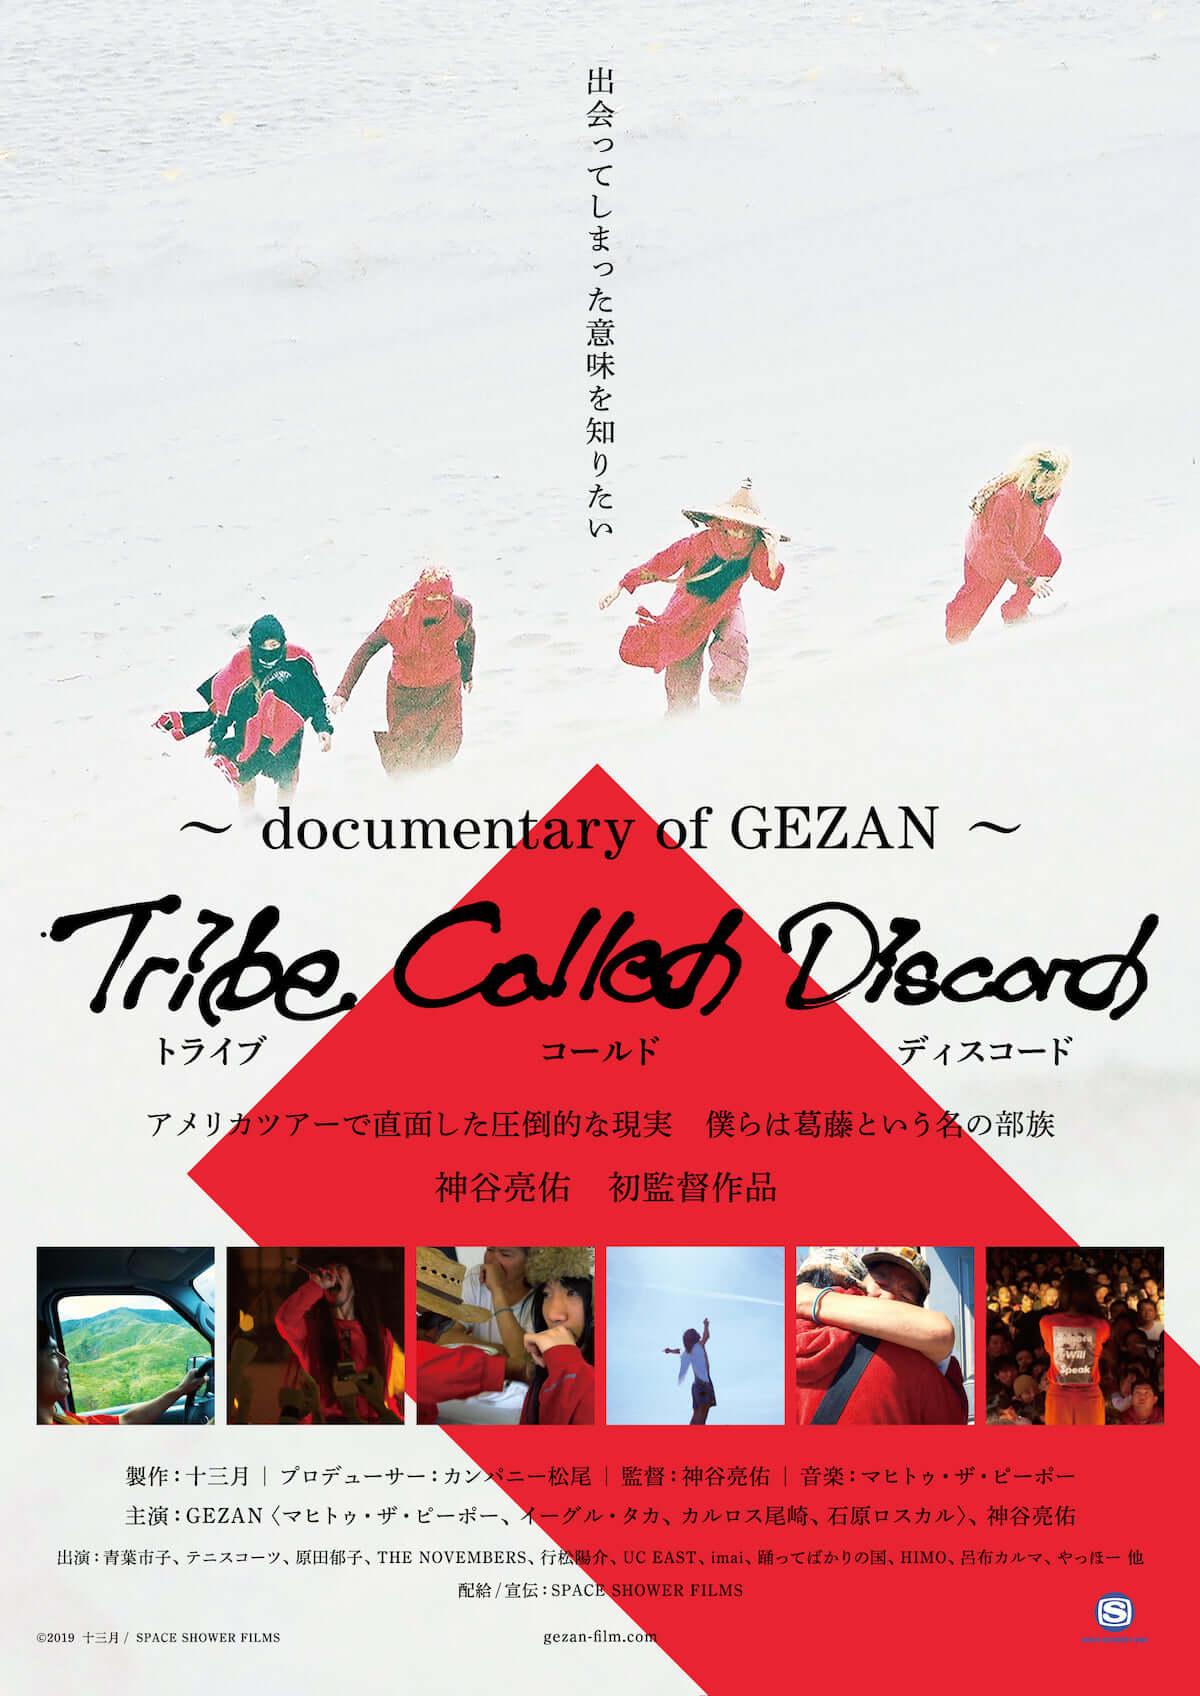 『Tribe Called Discord:Documentary of GEZAN』ライター磯部涼の映画評が公開 film190423_gezan_main-1200x1696